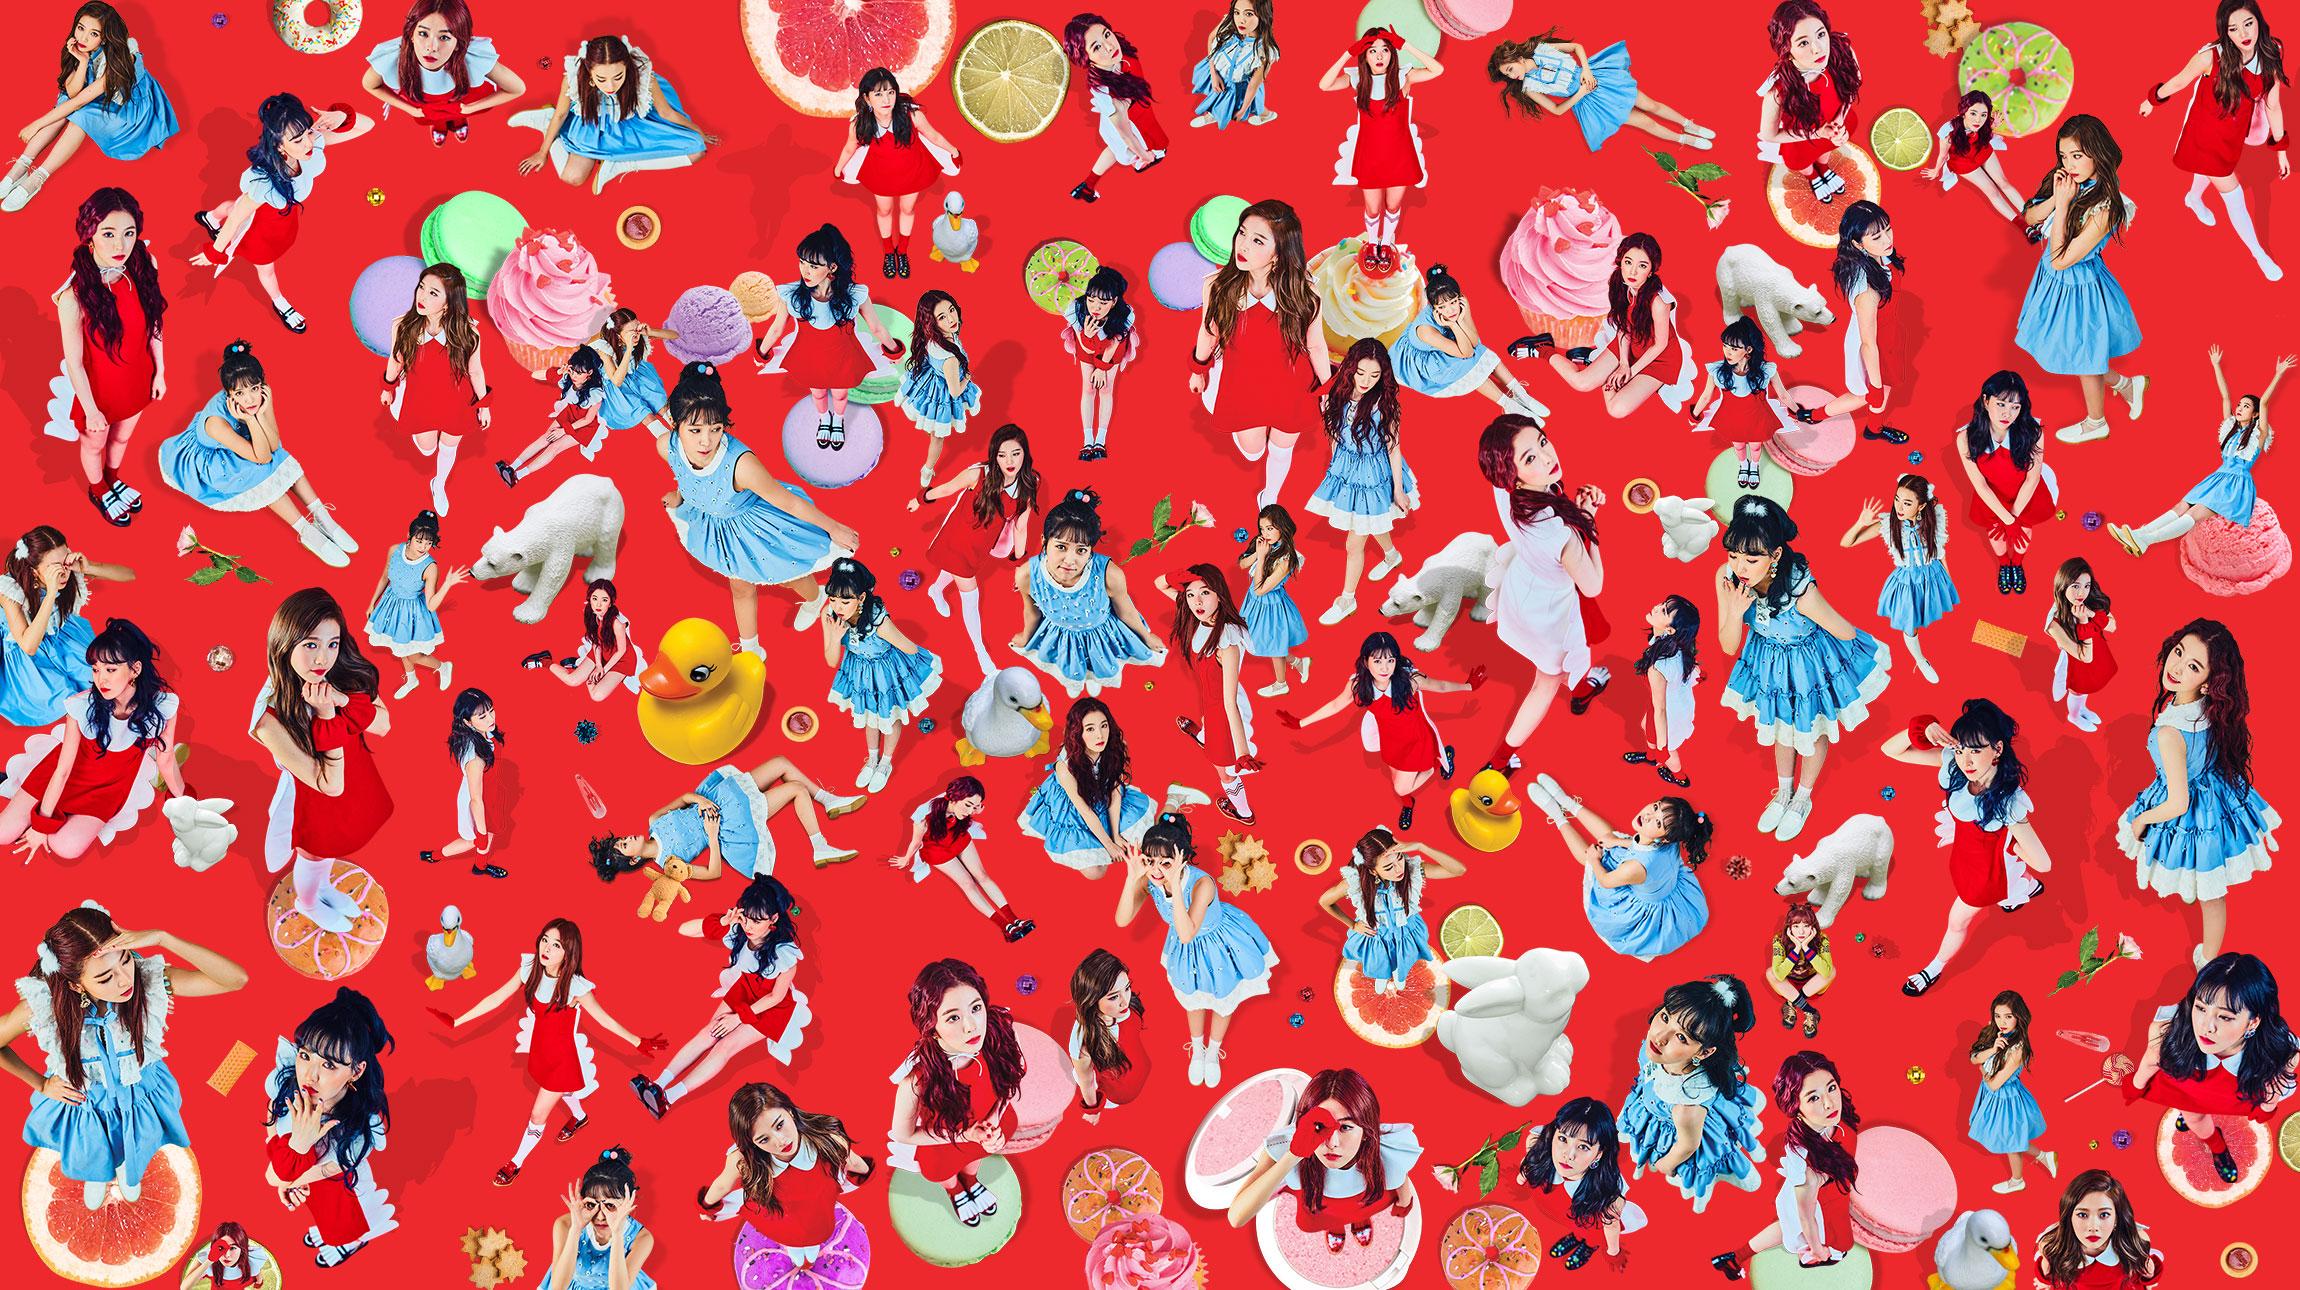 Fyeah Red Velvet